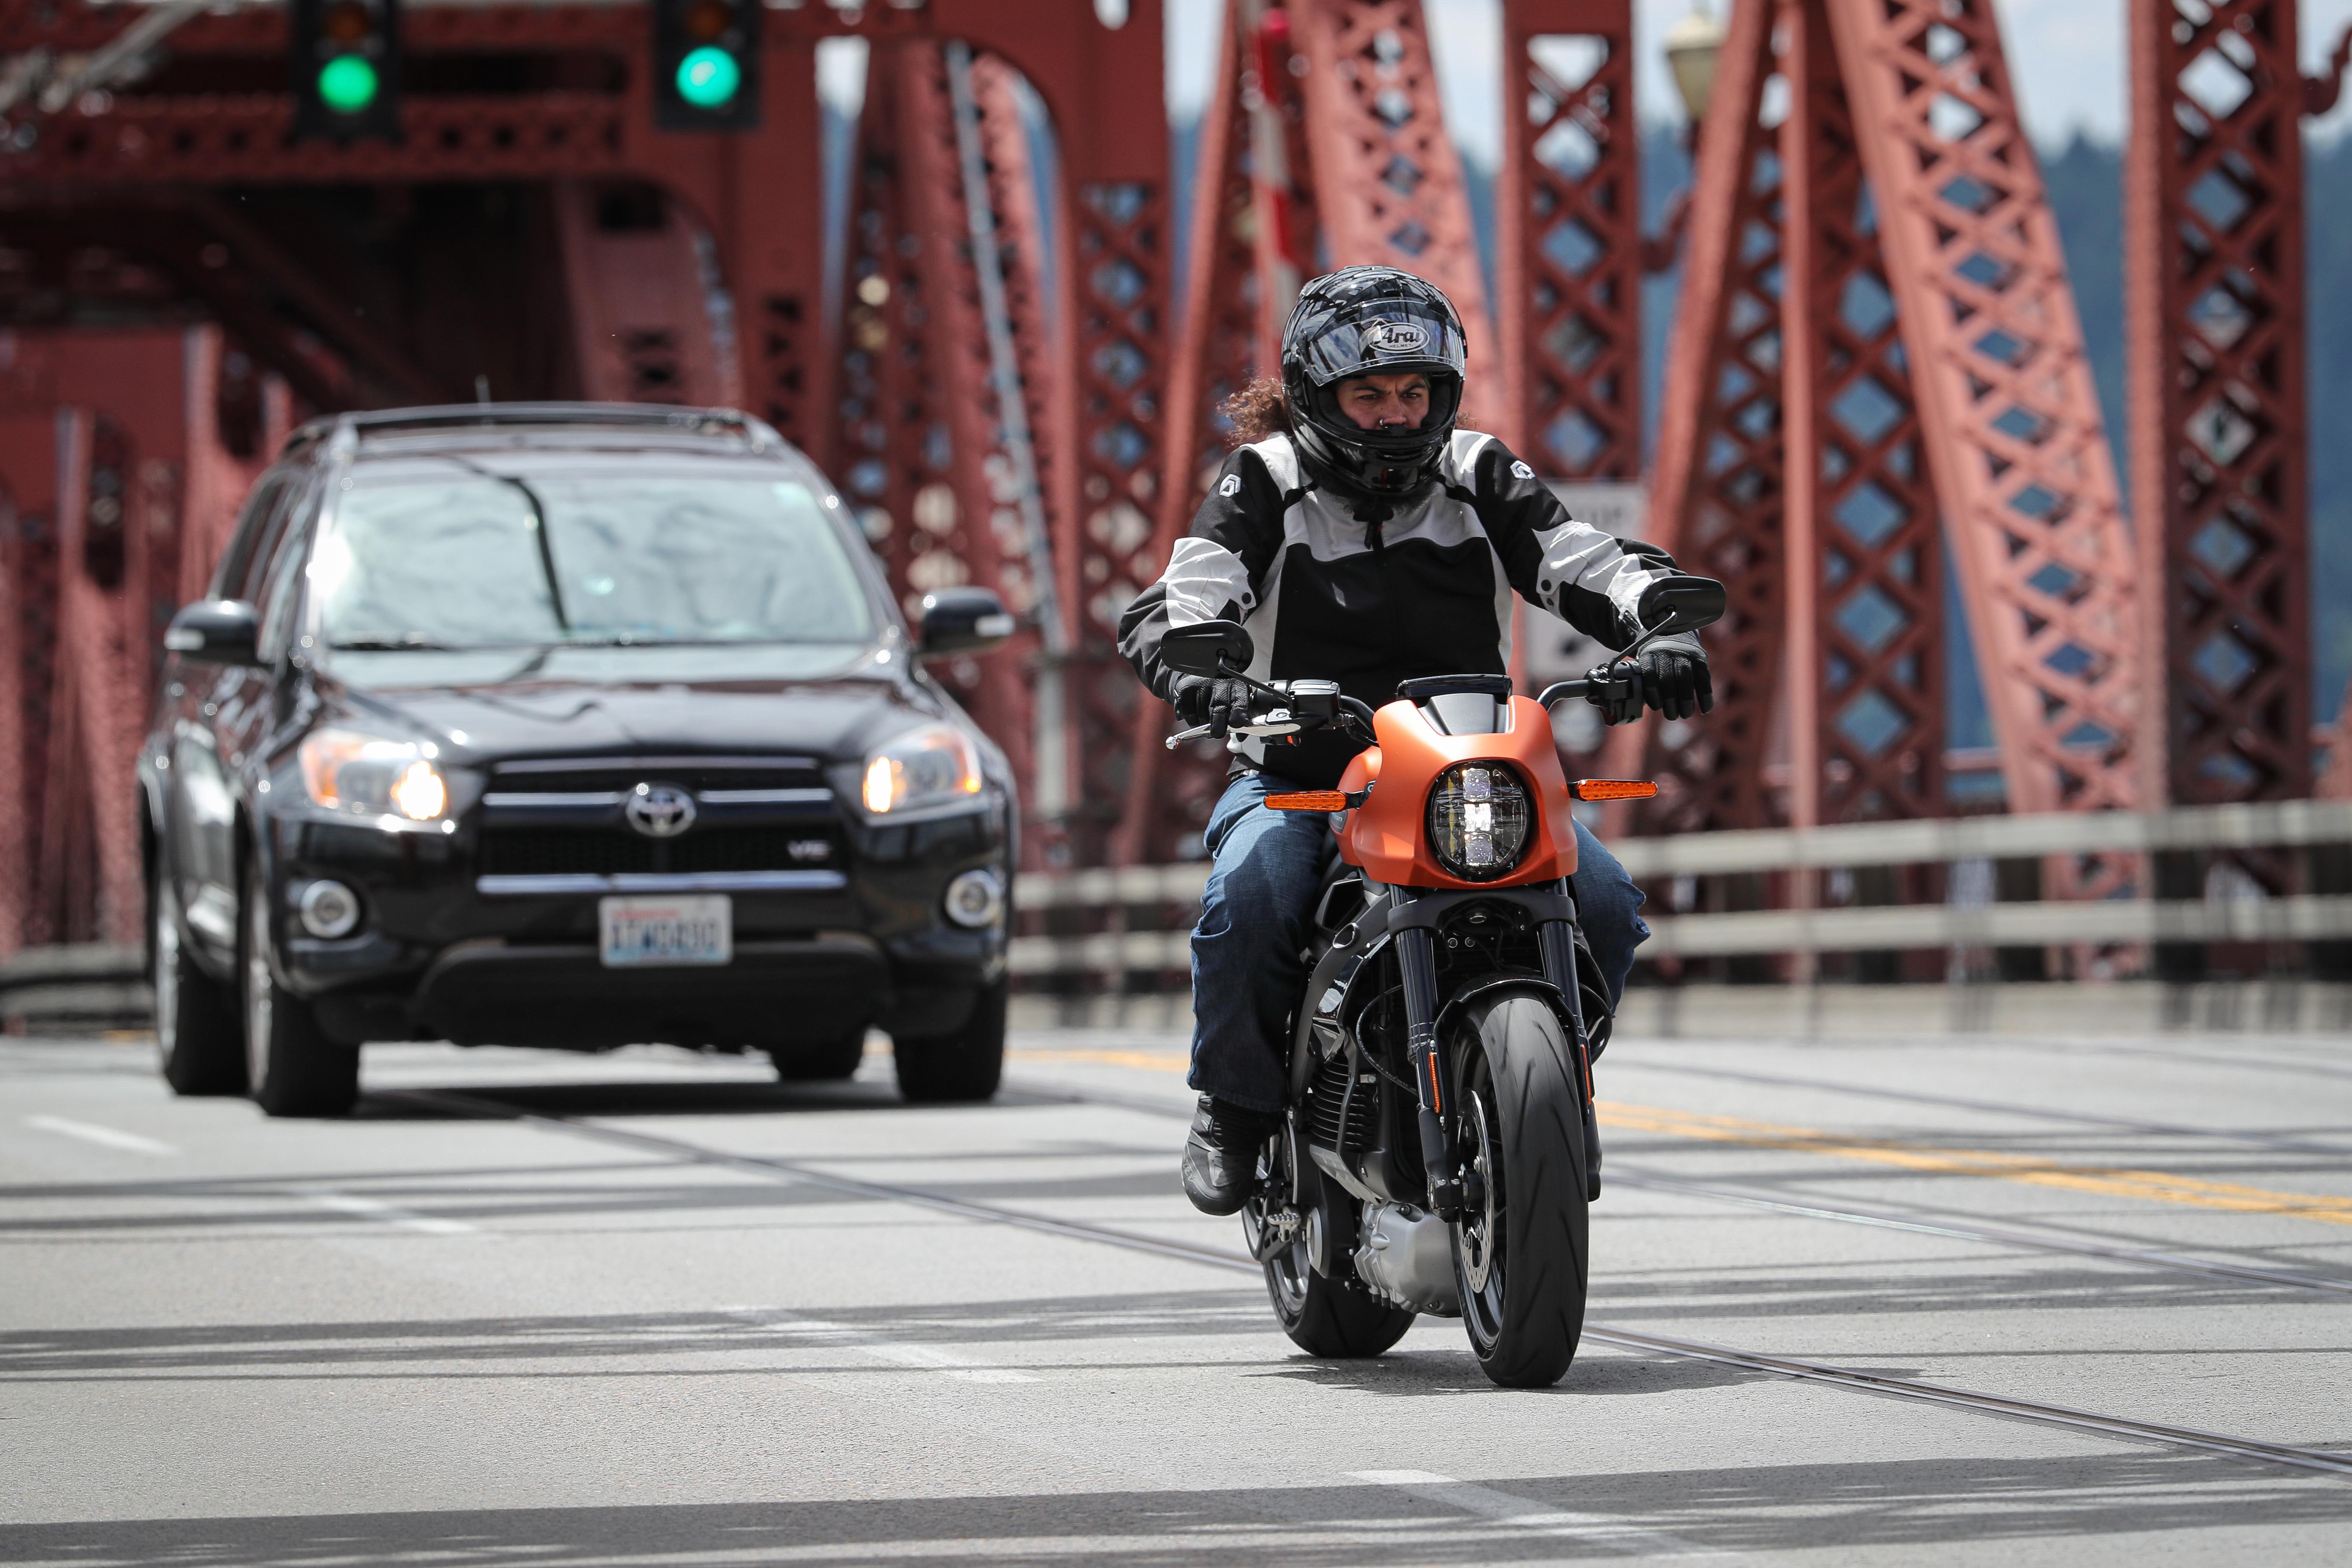 2020 Harley-Davidson LiveWire first ride - RevZilla